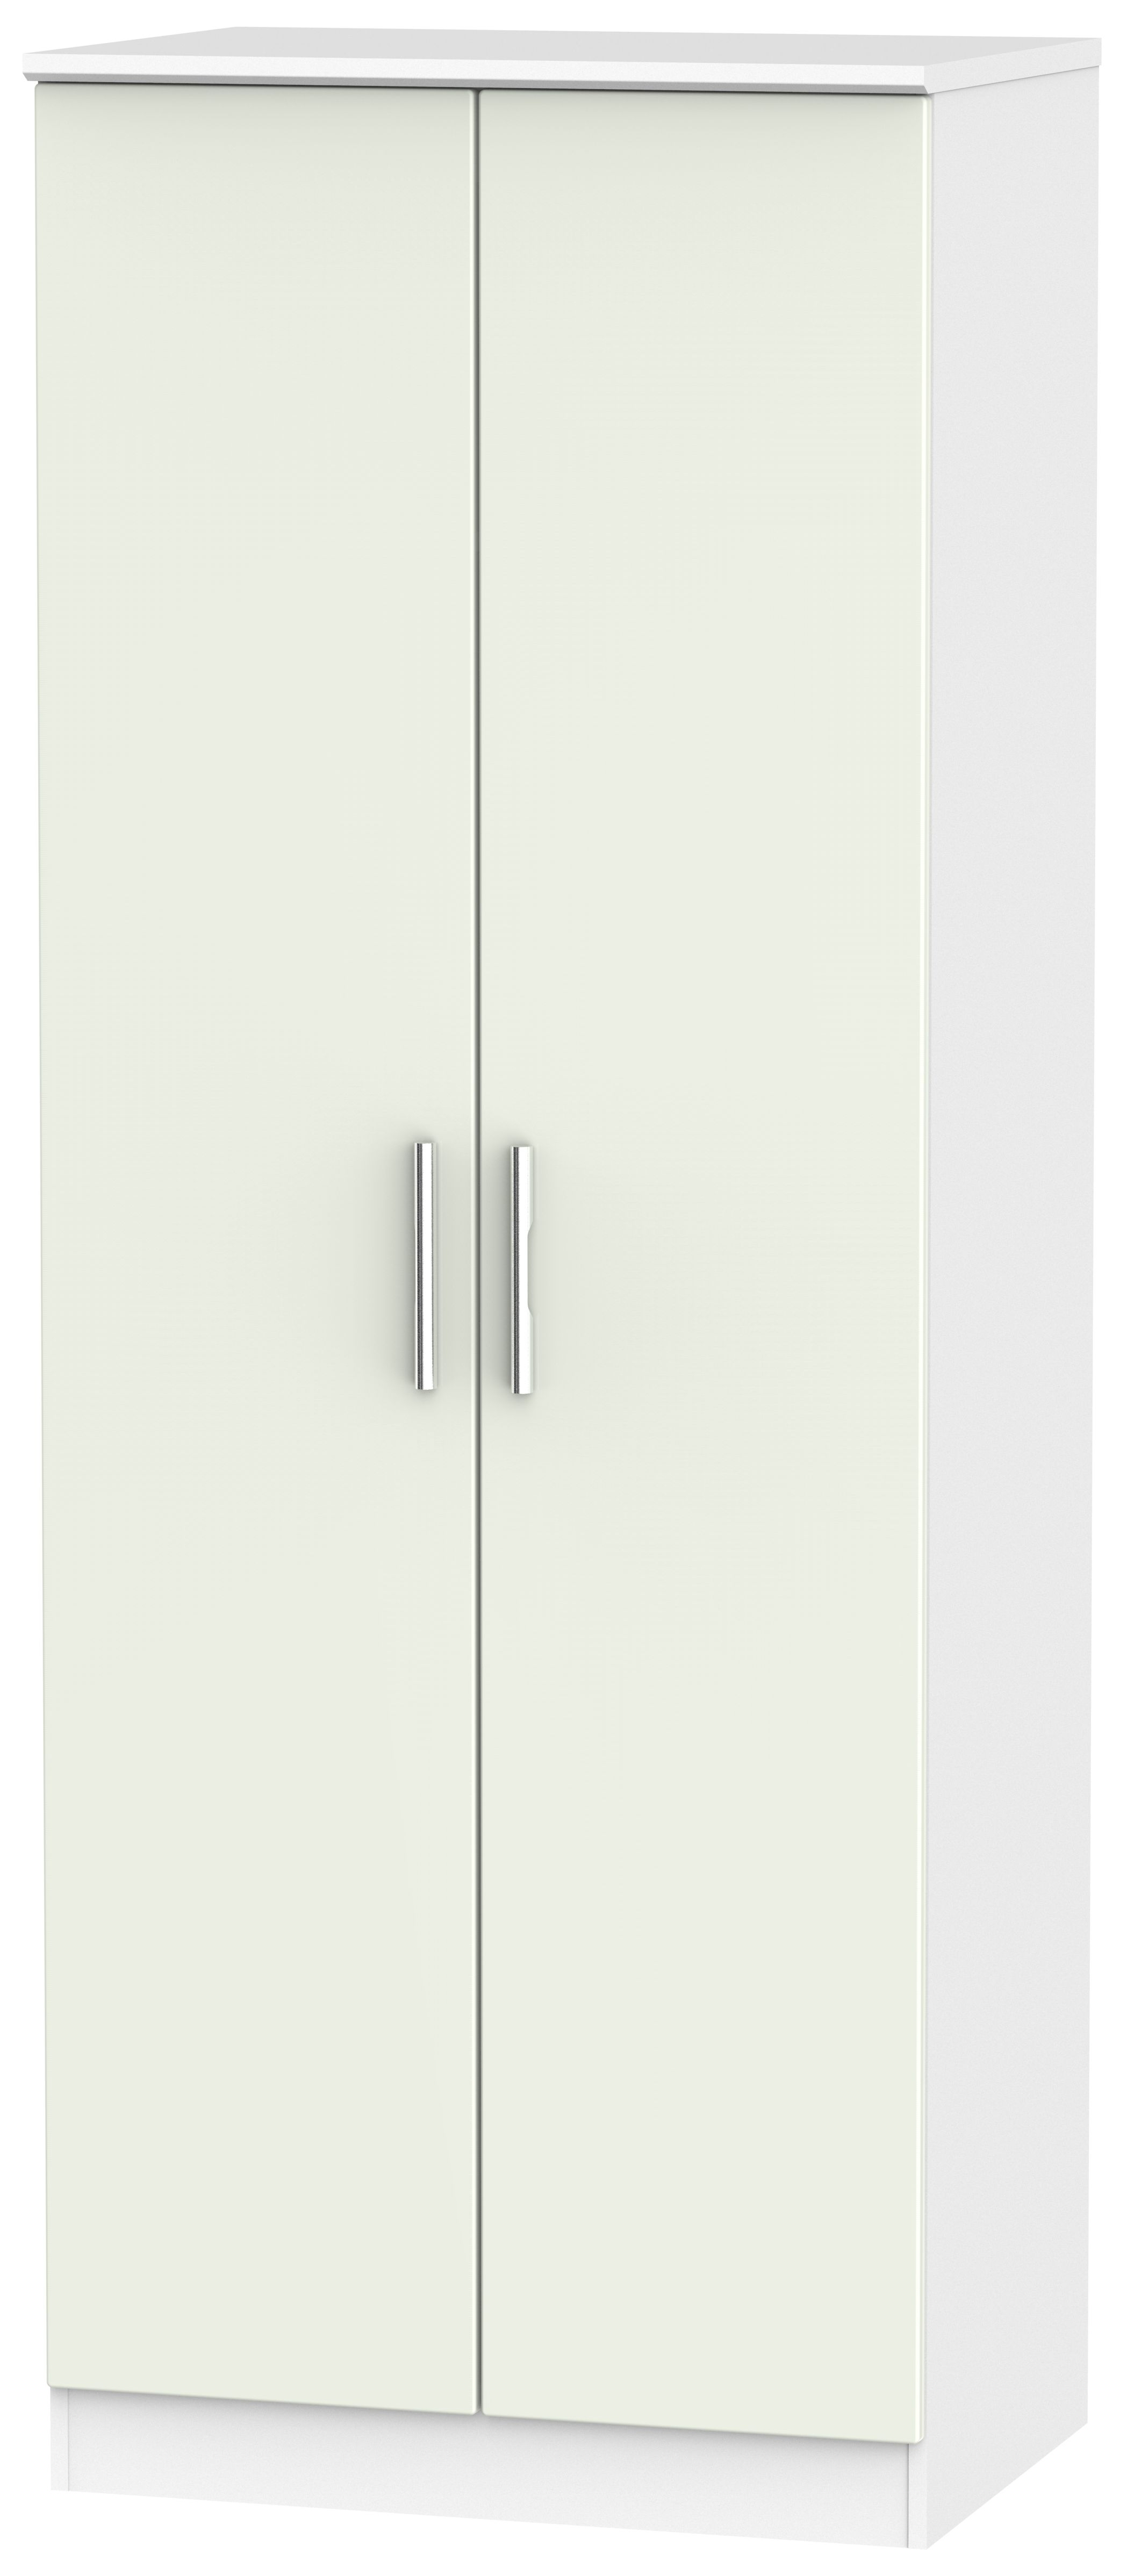 Knightsbridge 2 Door Tall Hanging Wardrobe - Kaschmir Matt and White